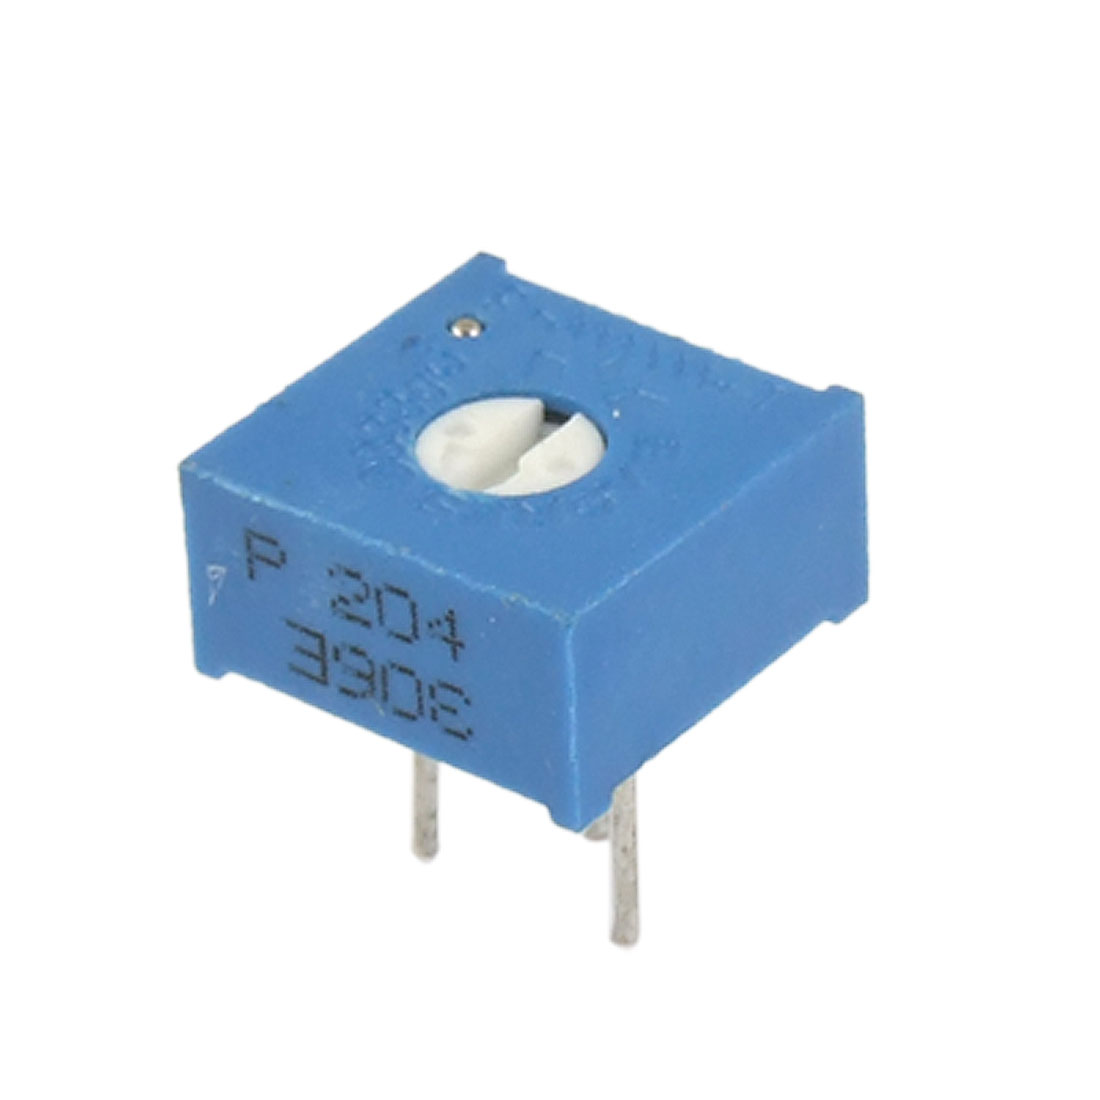 50x 3386P 204 200K Ohm Potentiometer Trimpot Variable Resistors